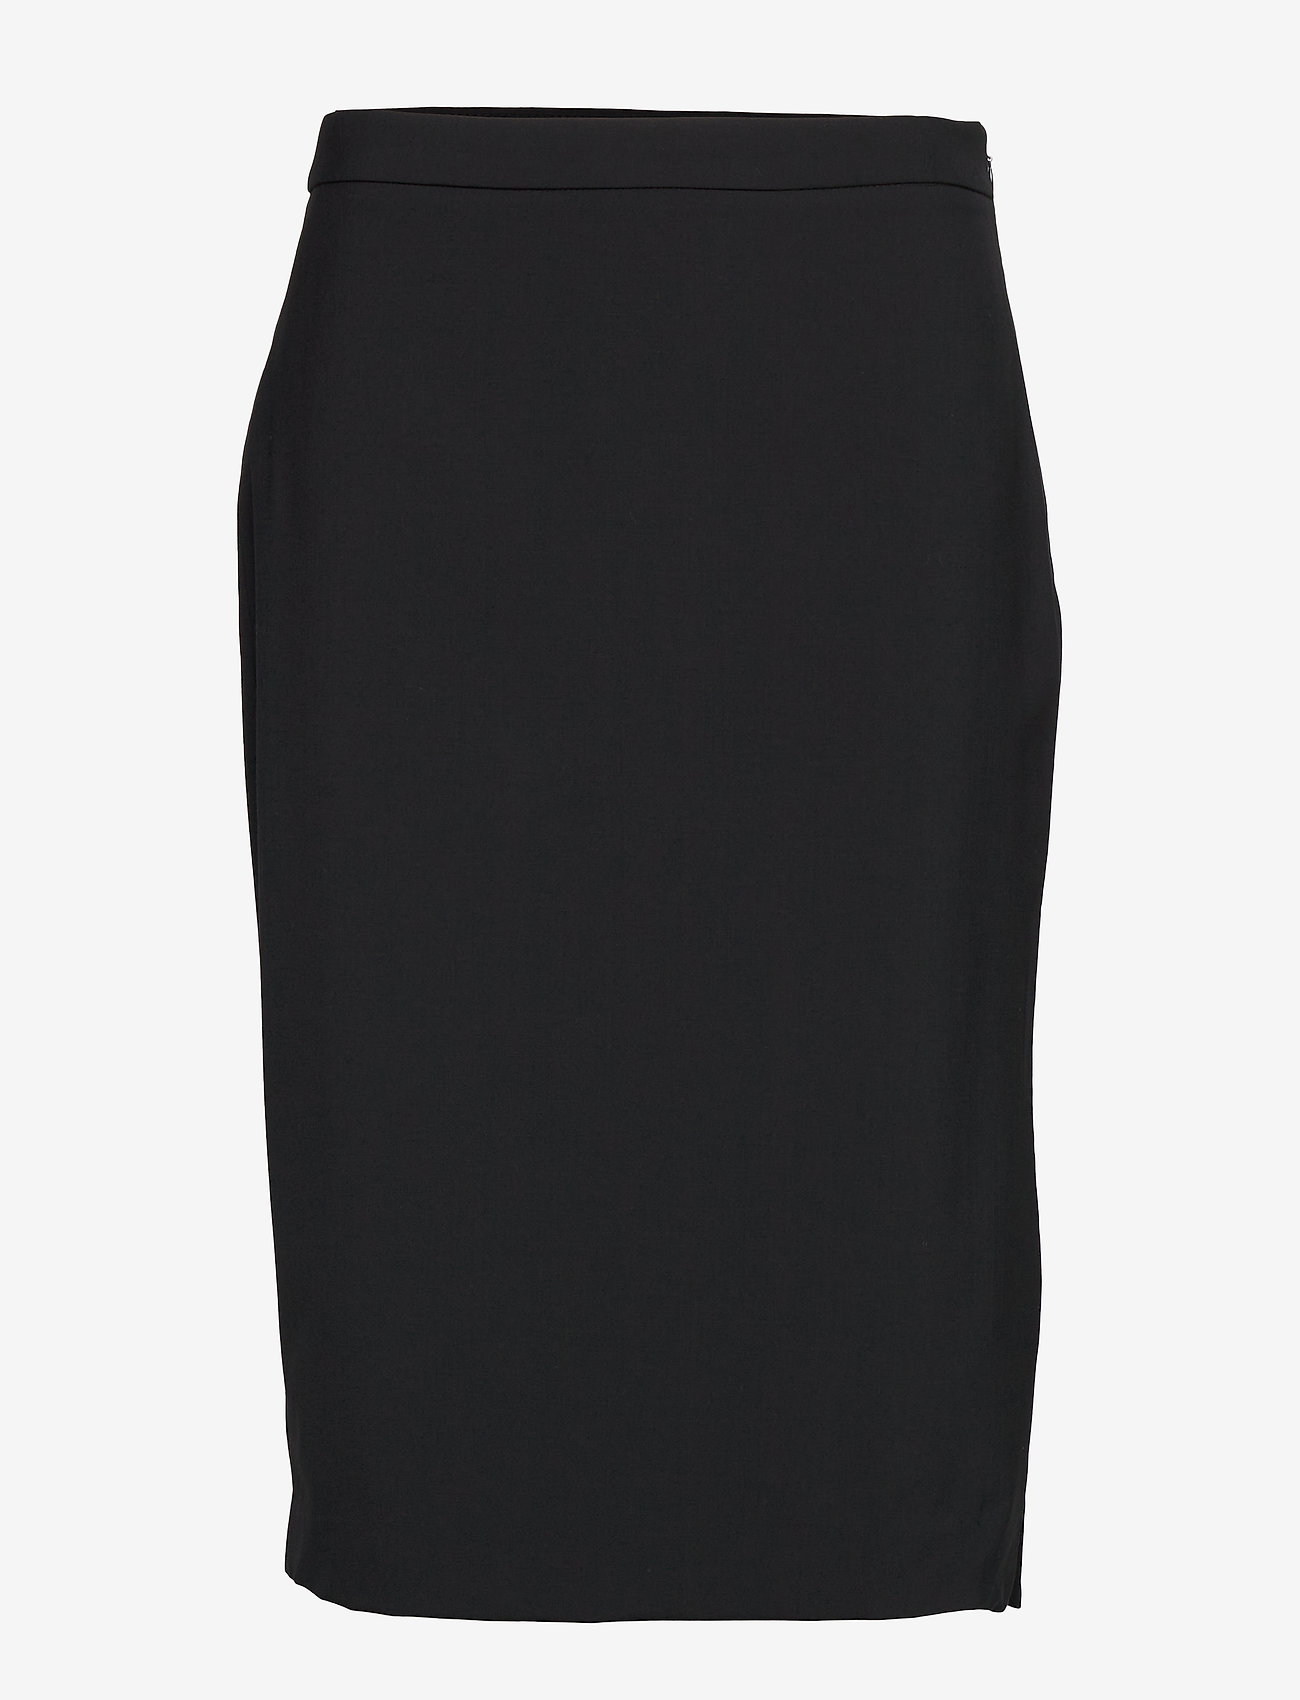 Banana Republic - Washable Italian Wool-Blend Pencil Skirt with Side Slit - midi skirts - black - 0